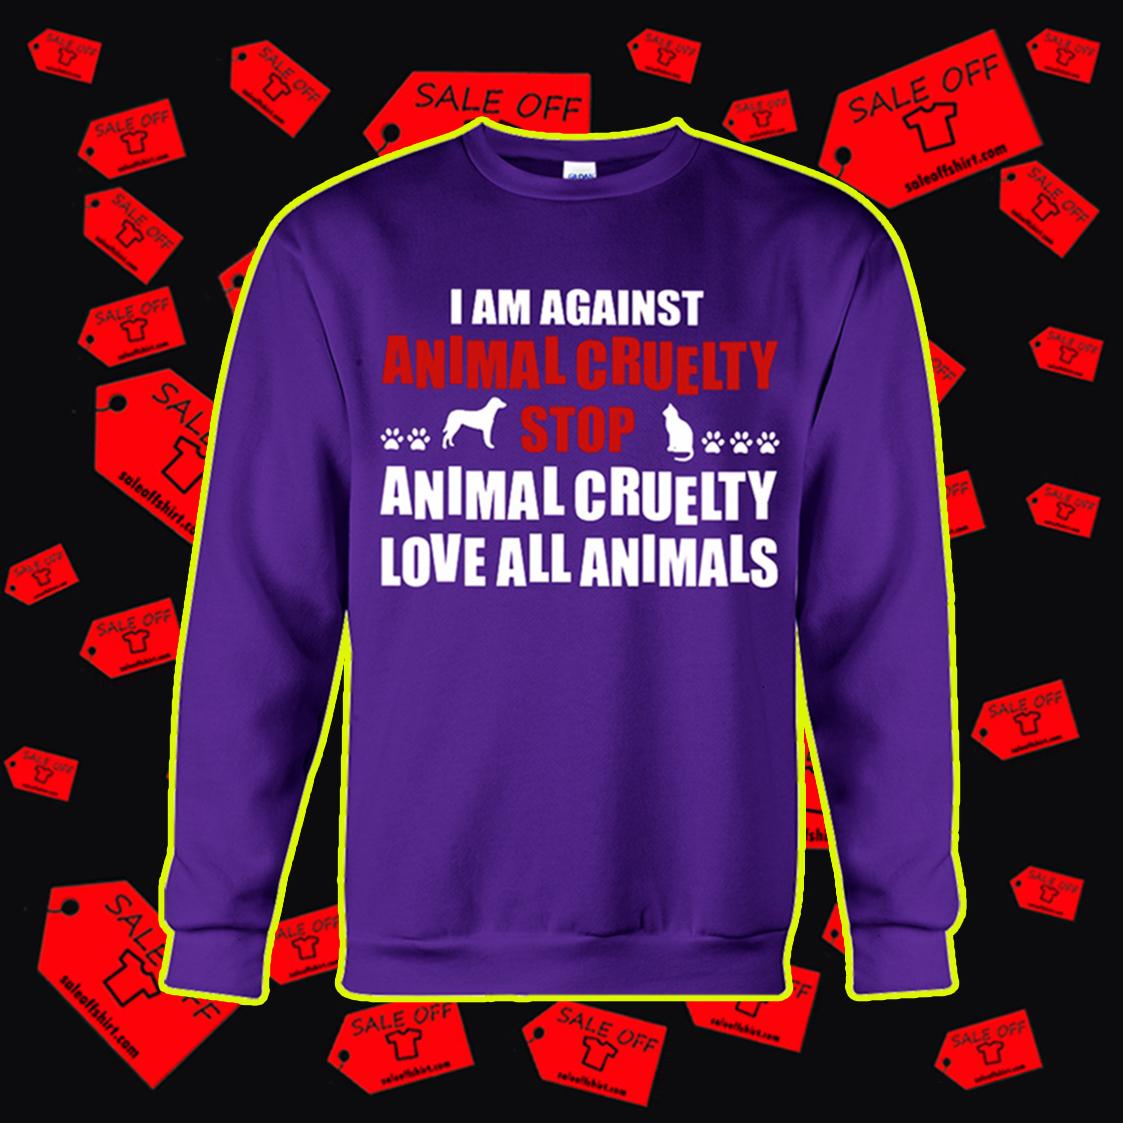 I am against animal cruelty stop animal cruelty love all animals sweatshirt